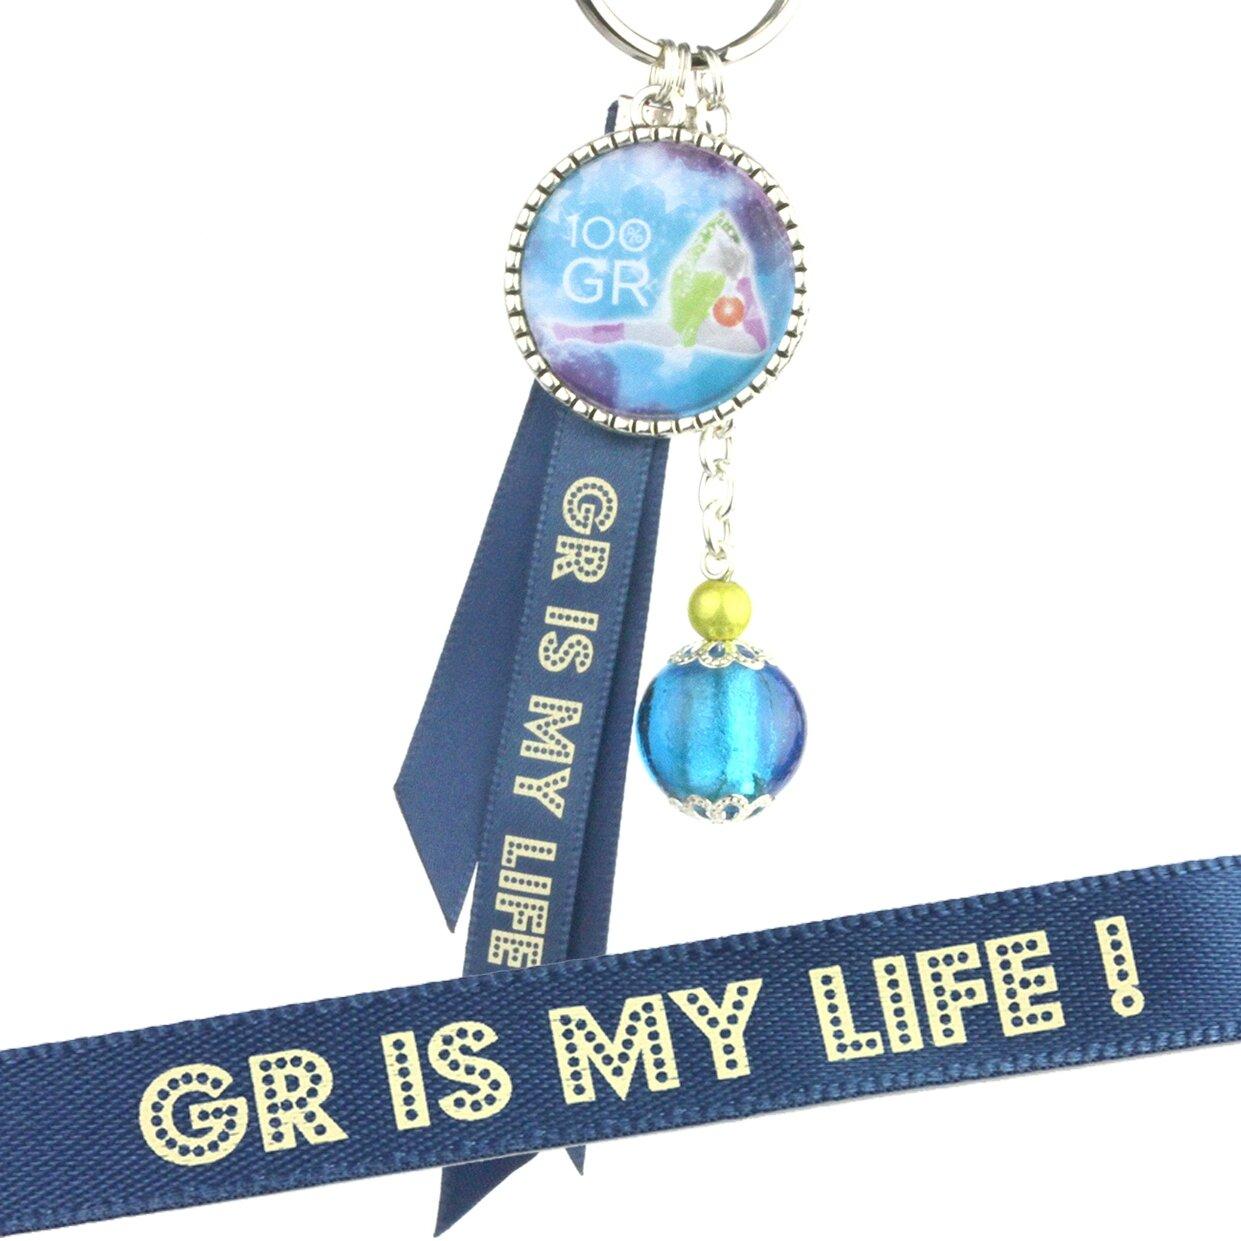 porte cles GR bleu bleu 3